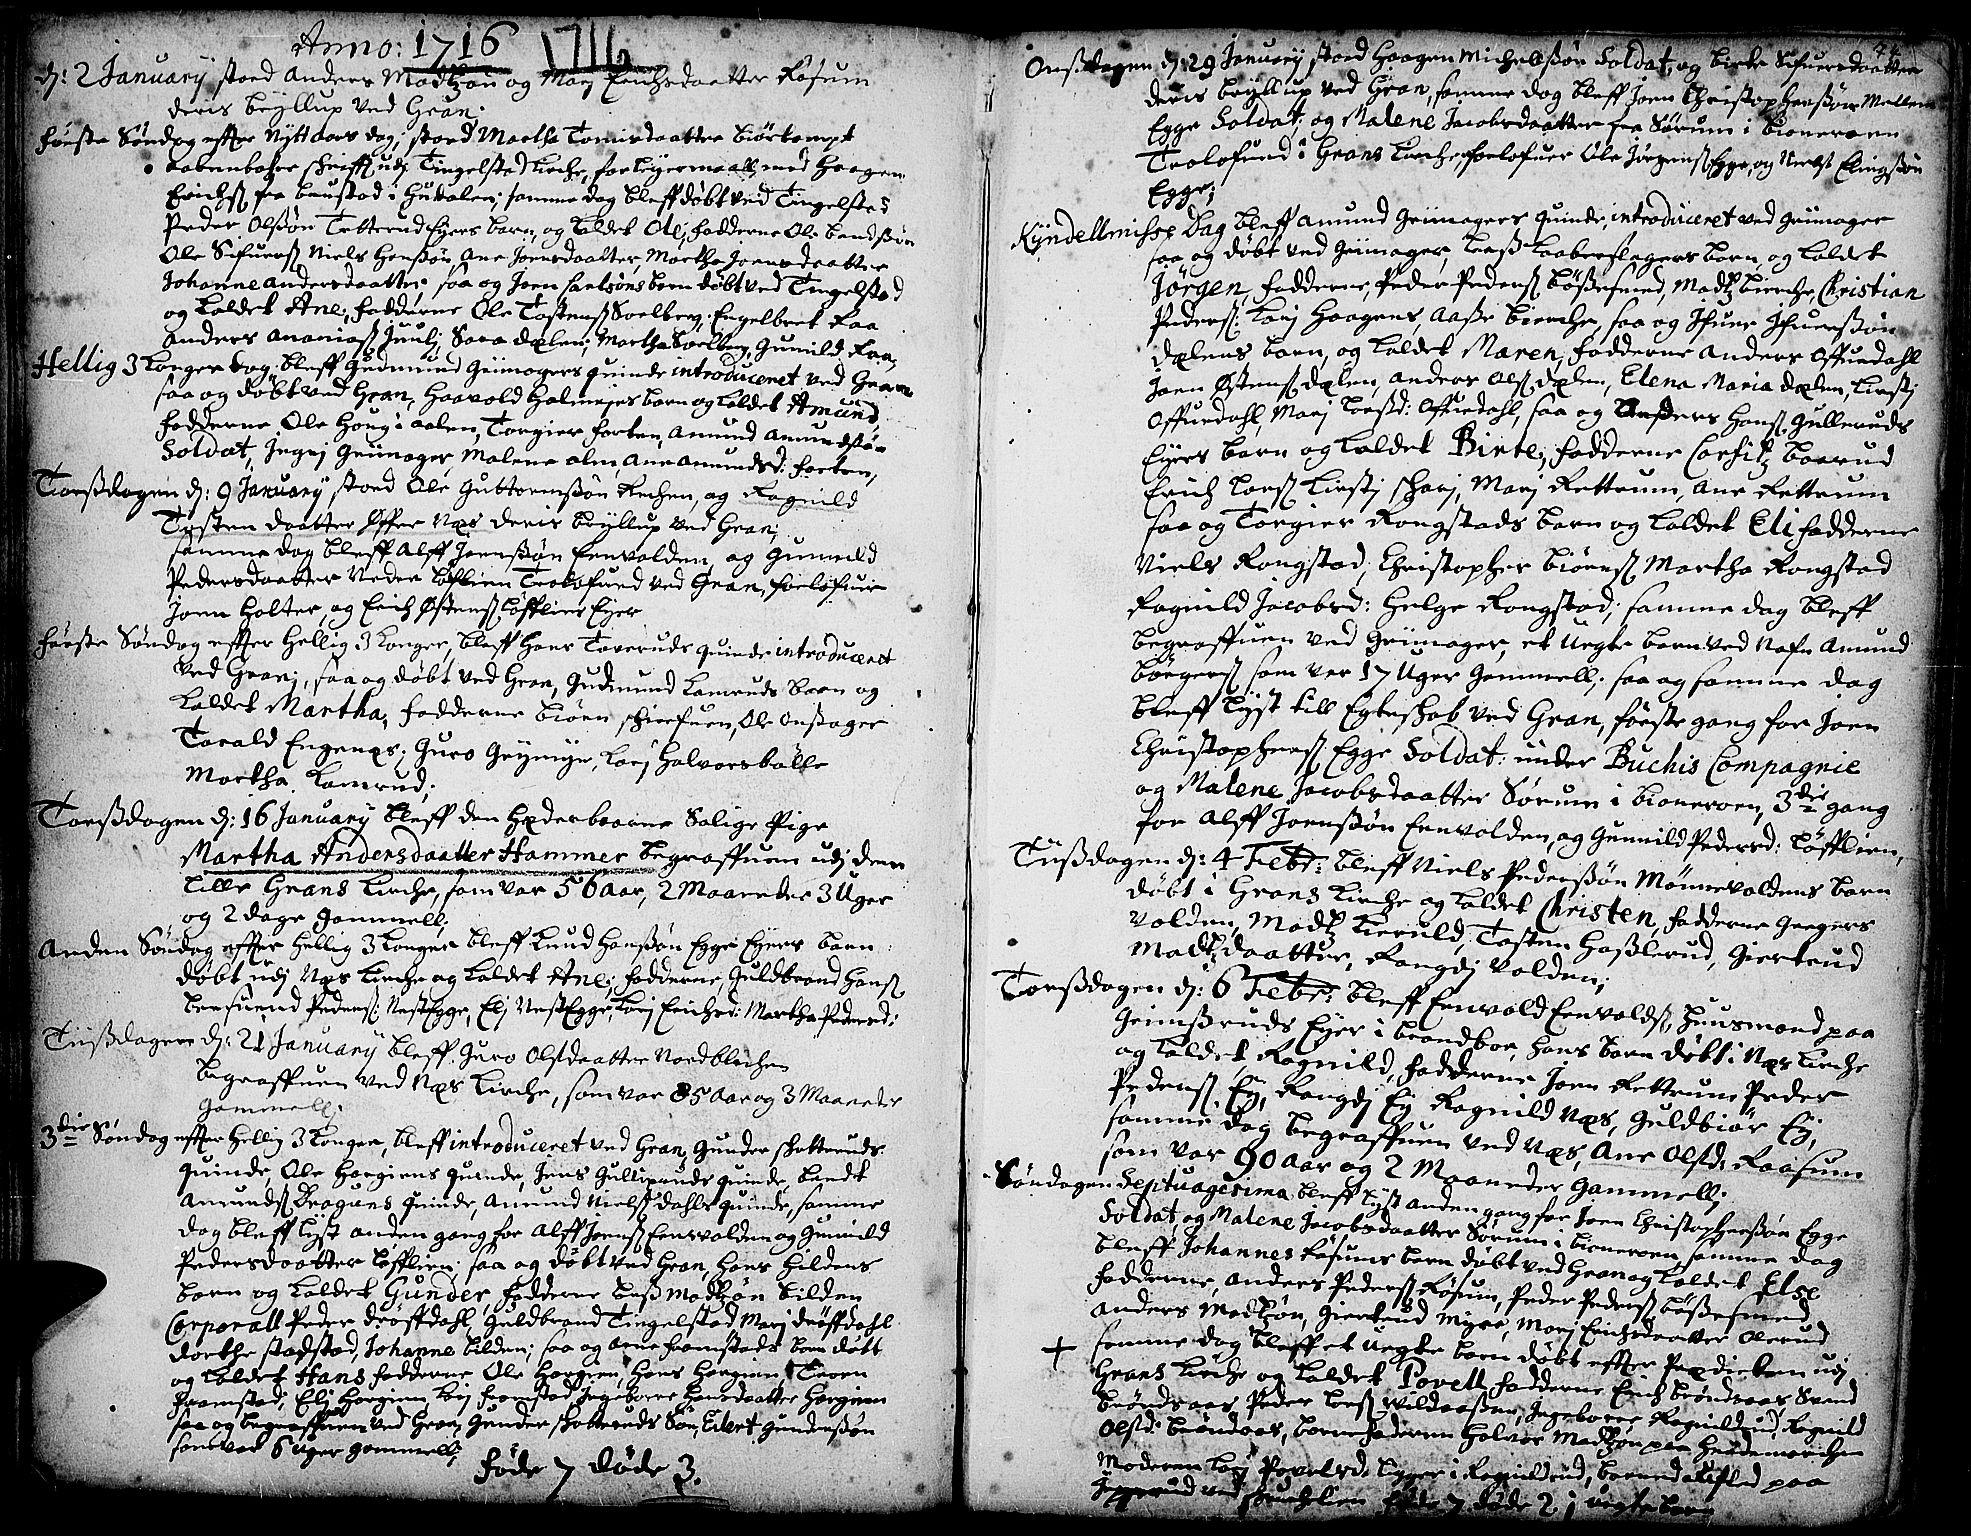 SAH, Gran prestekontor, Parish register (official) no. 1, 1707-1731, p. 74